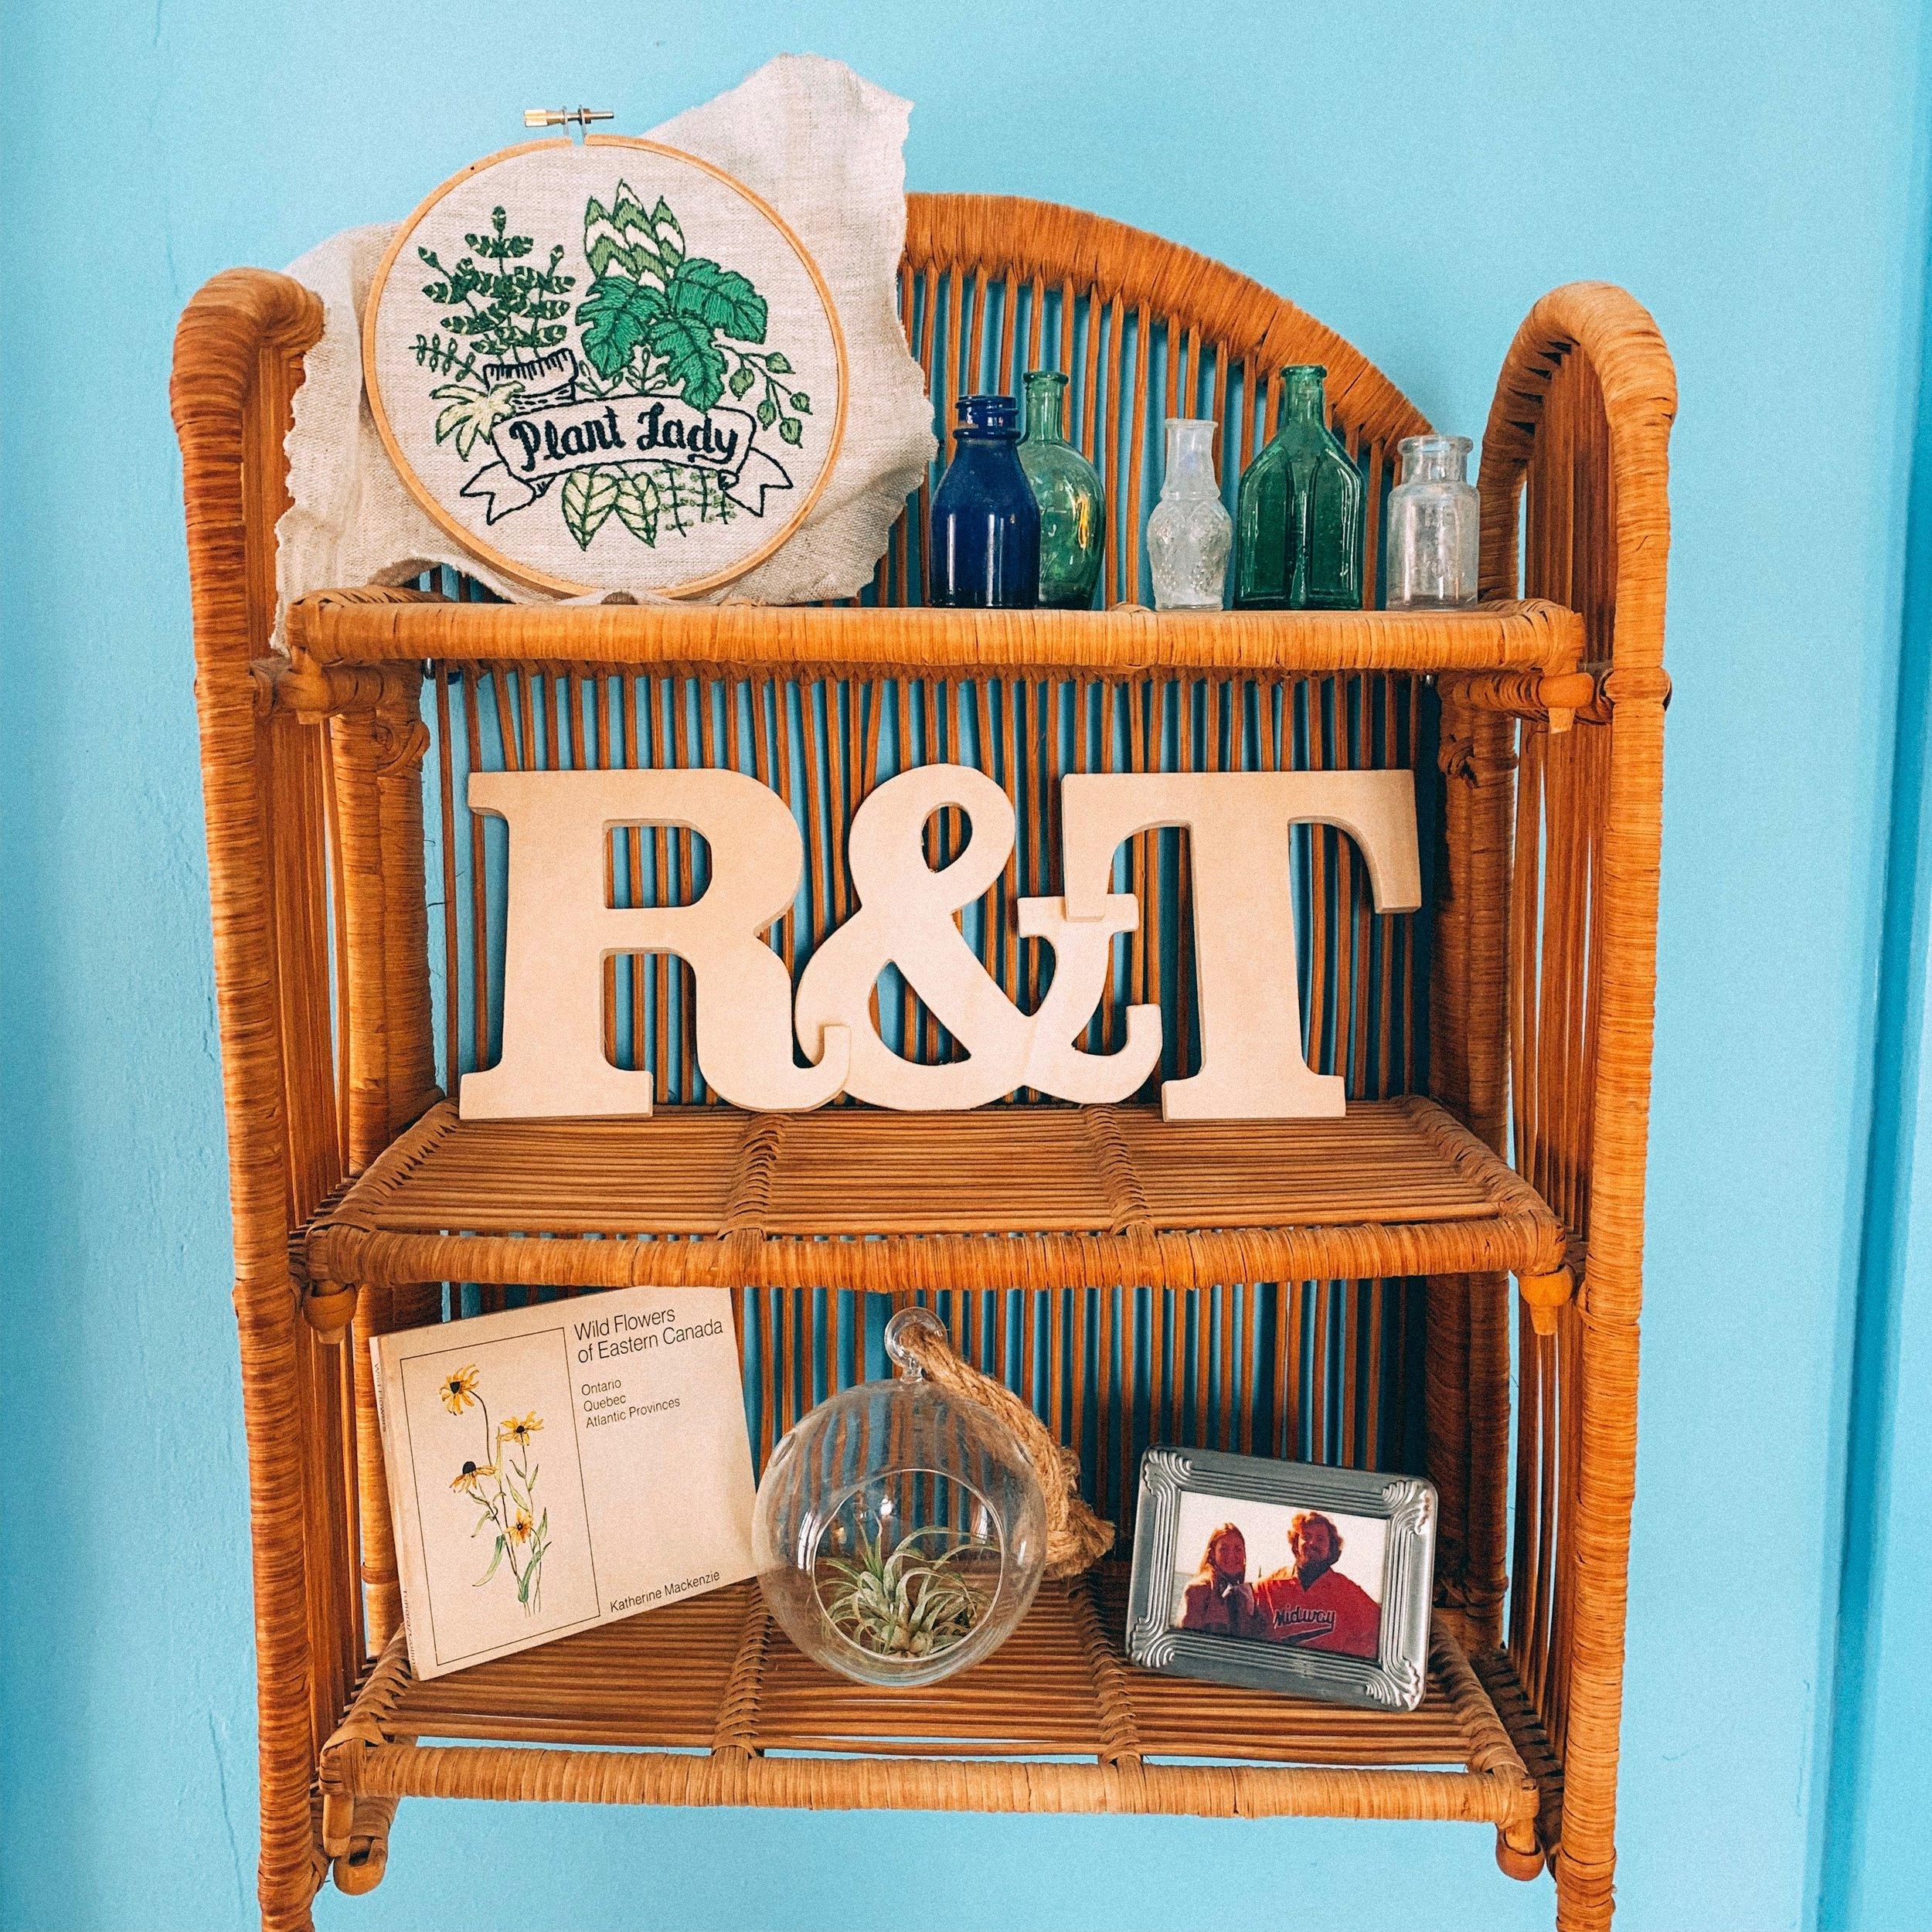 My mother's vintage rattan shelf